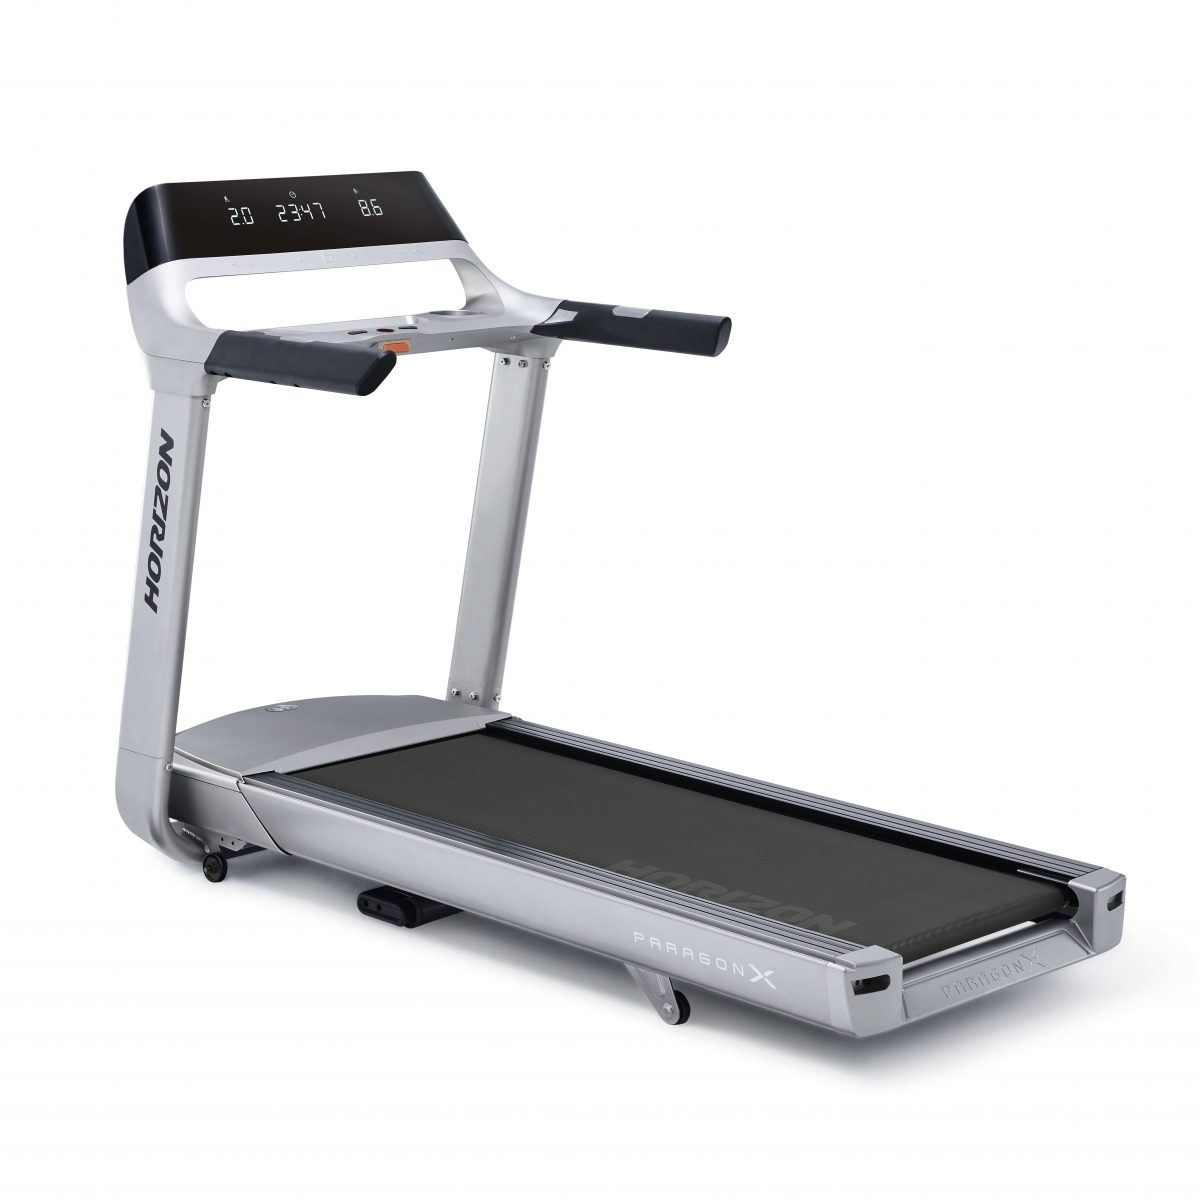 "Horizon Fitness Laufband ""Paragon X"" - Fitnessgeräte - Horizon Fitness"